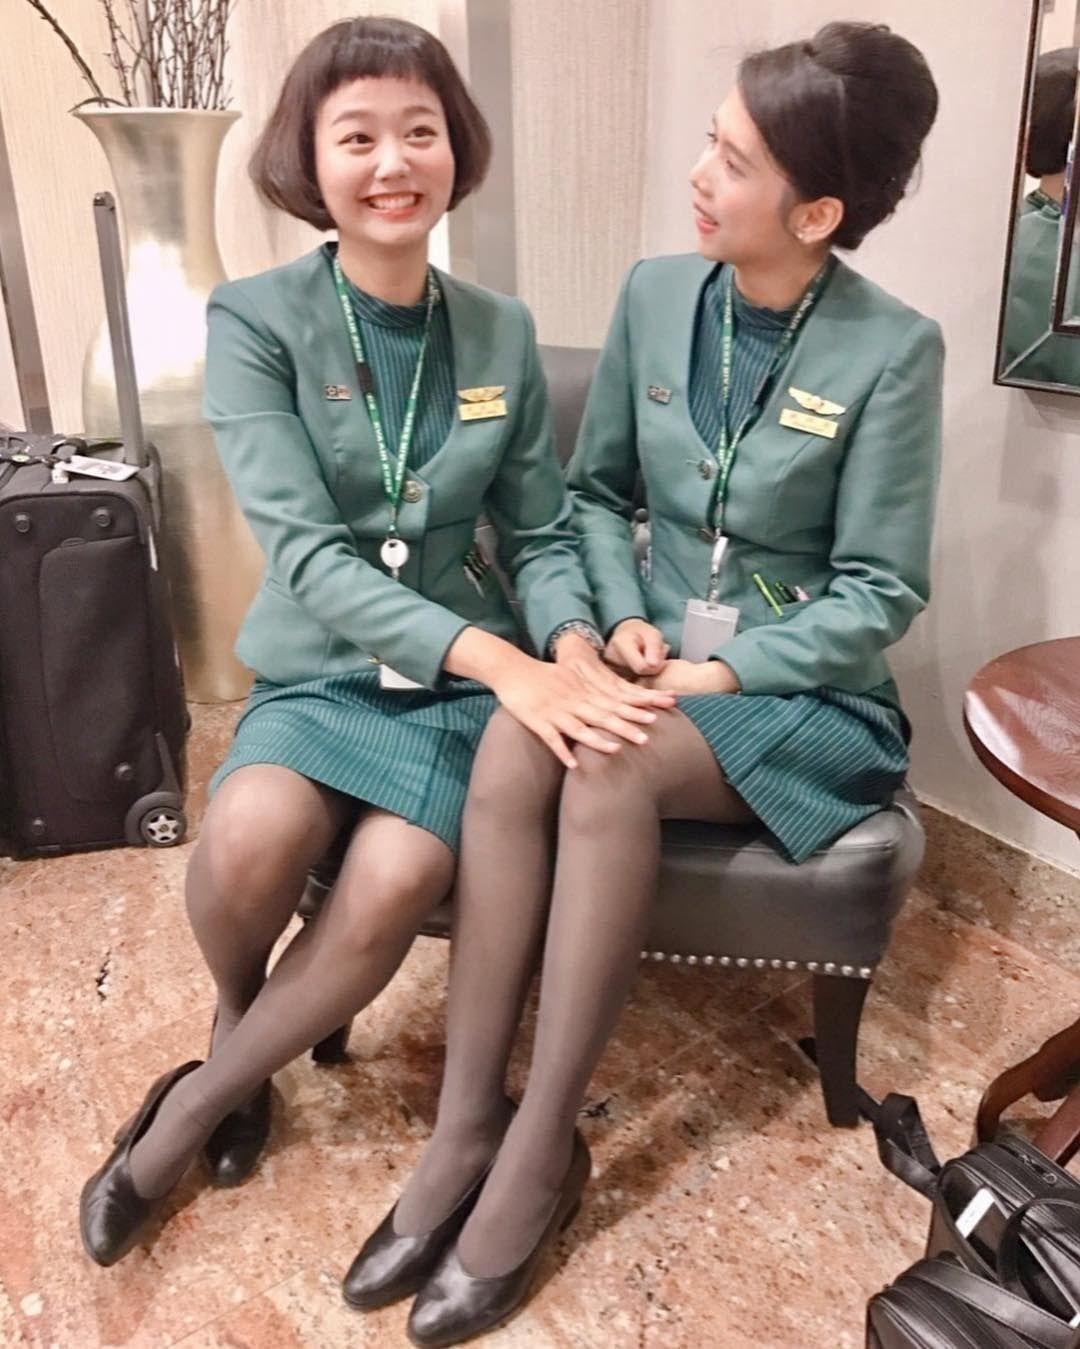 Pin on Asian Flight Attendants / Cabin Crew